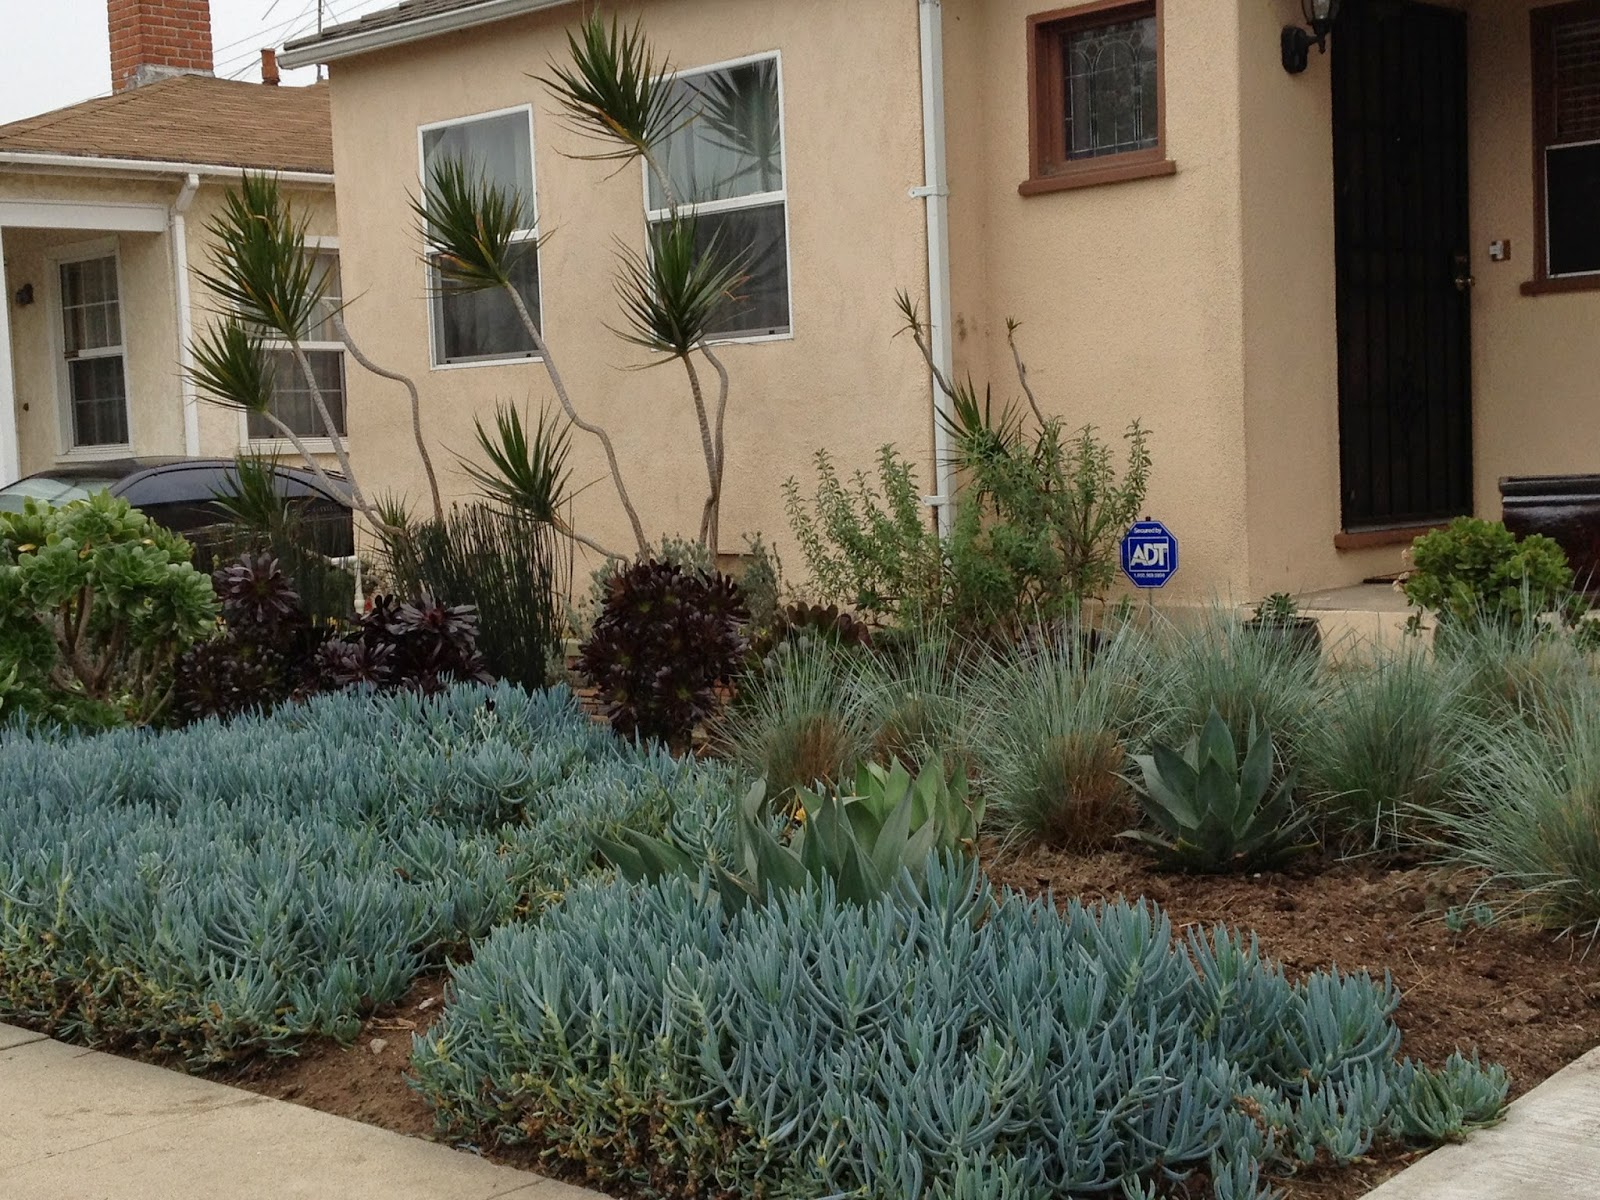 mar vista green garden showcase 3827 coolidge avenue cluster 1l